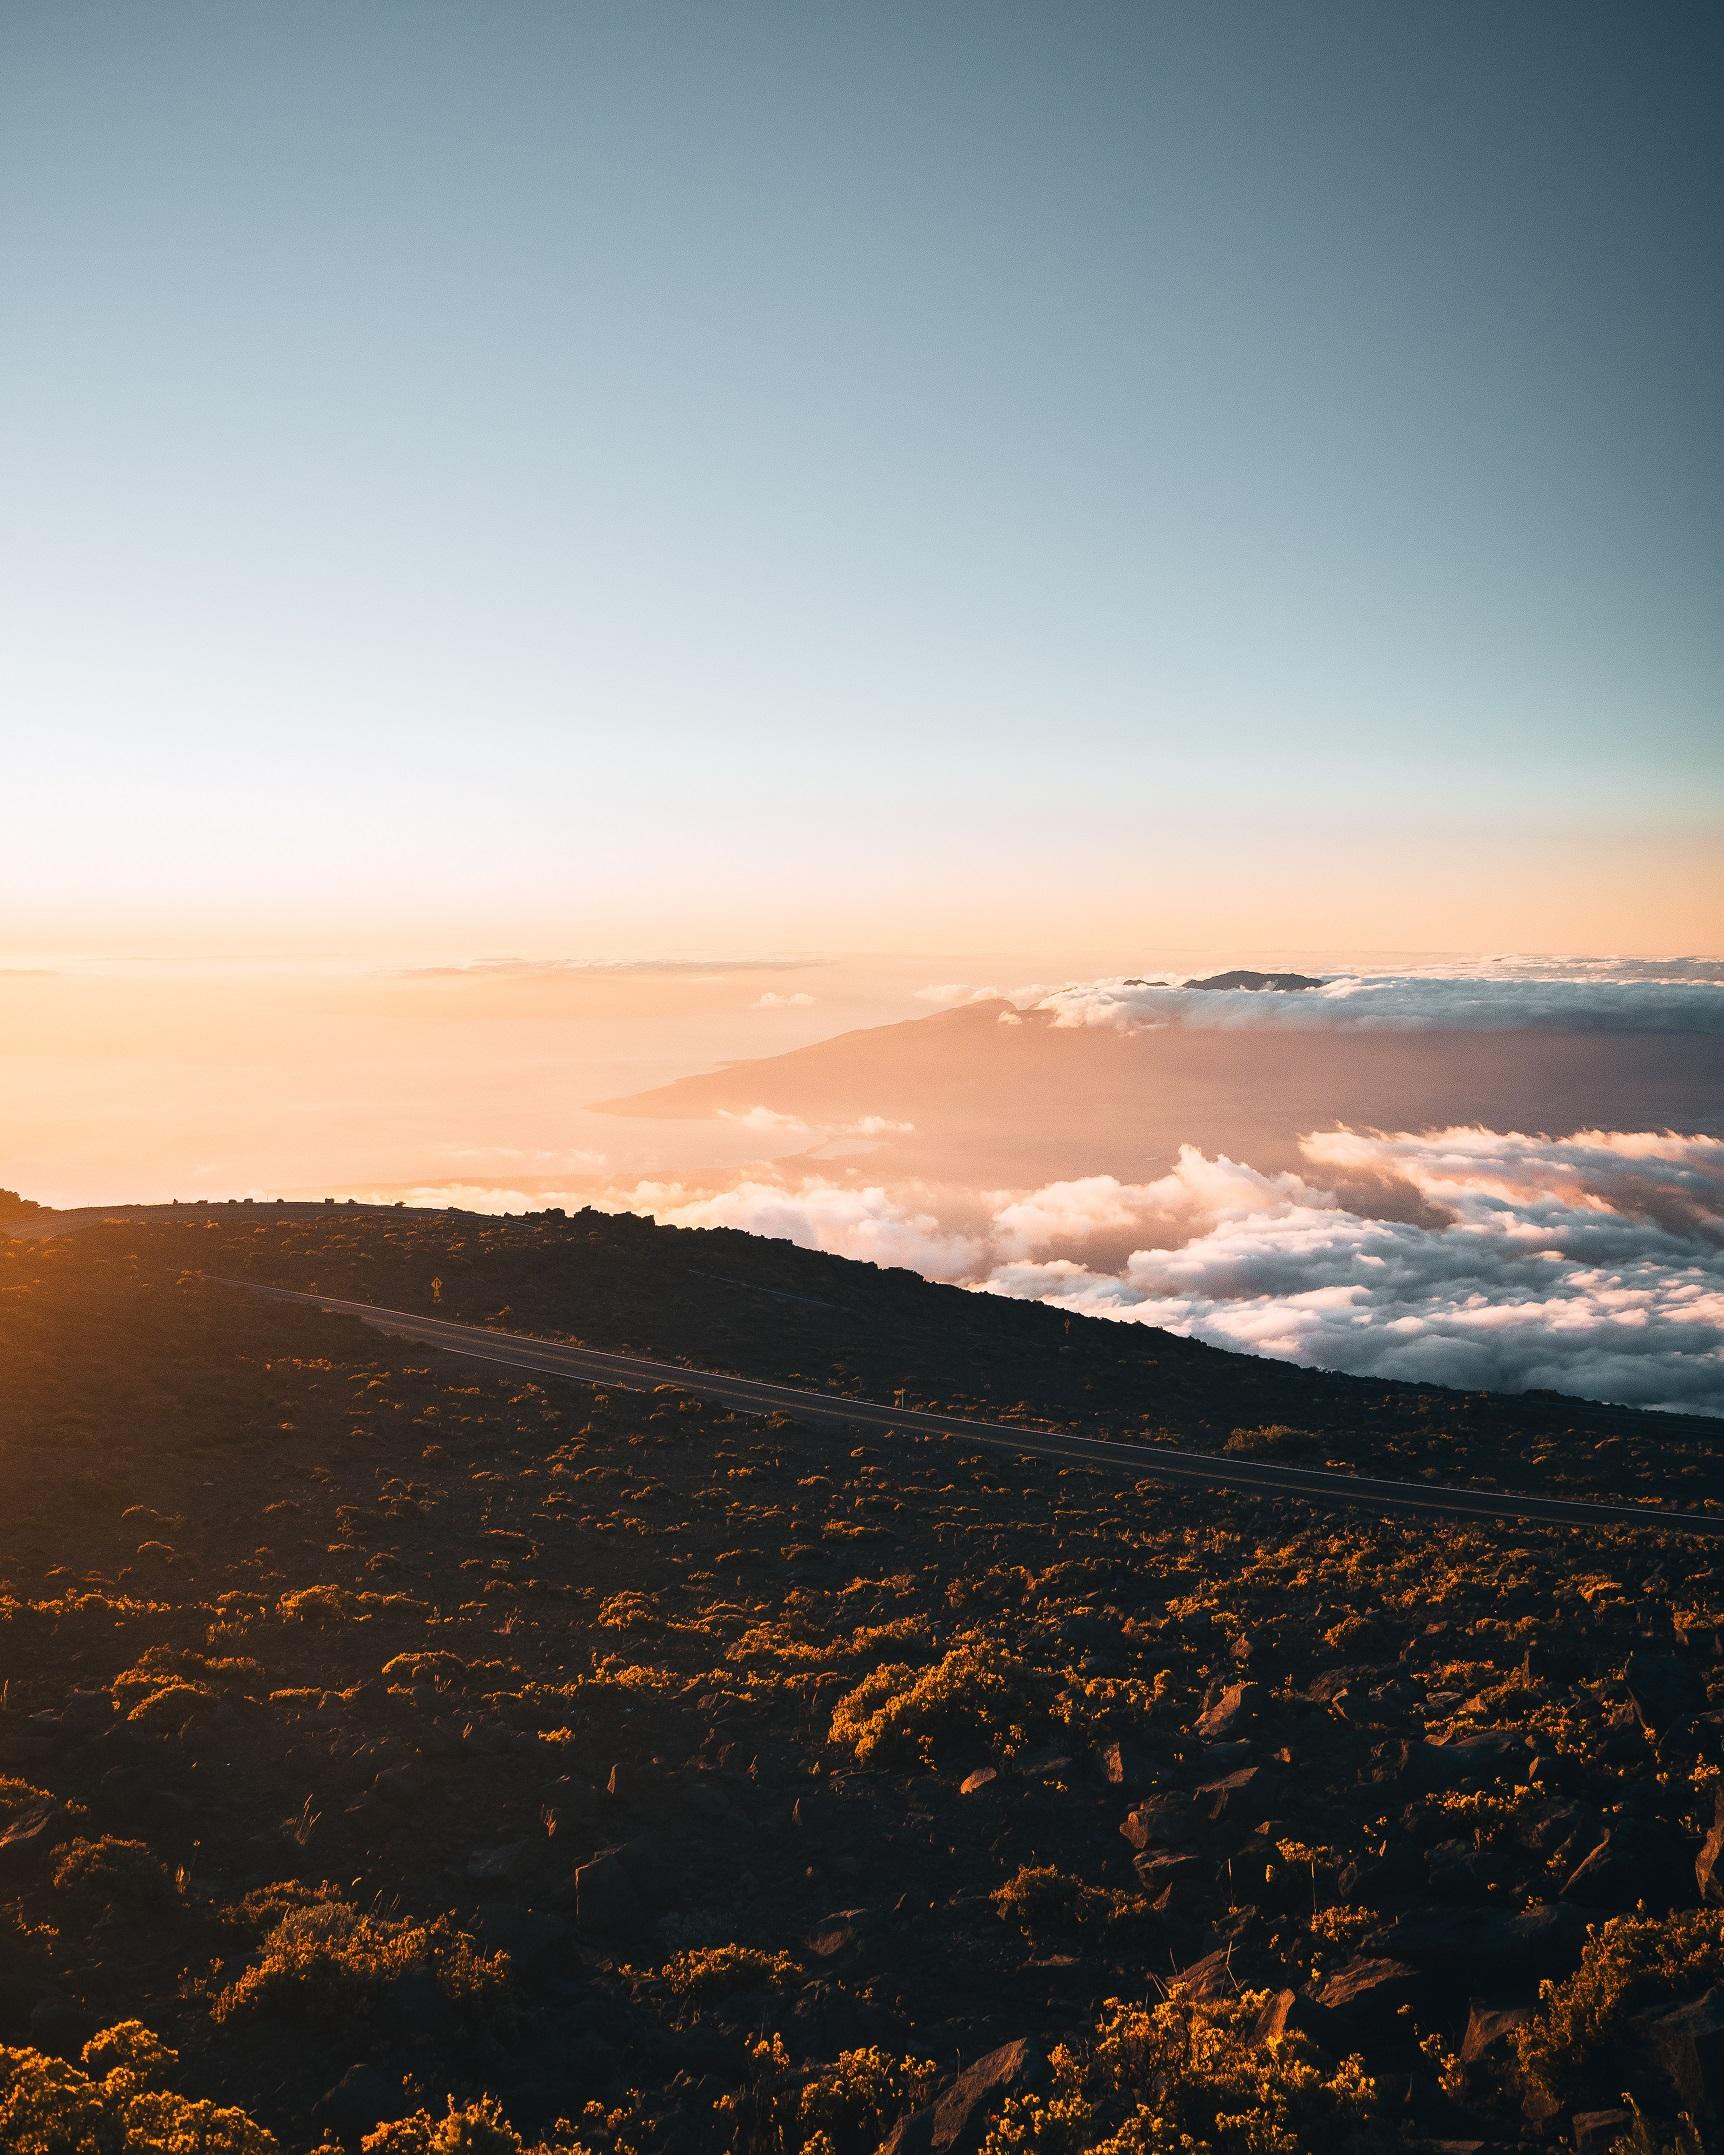 Above the clouds during sunset at Haleakalā National Park, Maui, Hawaii